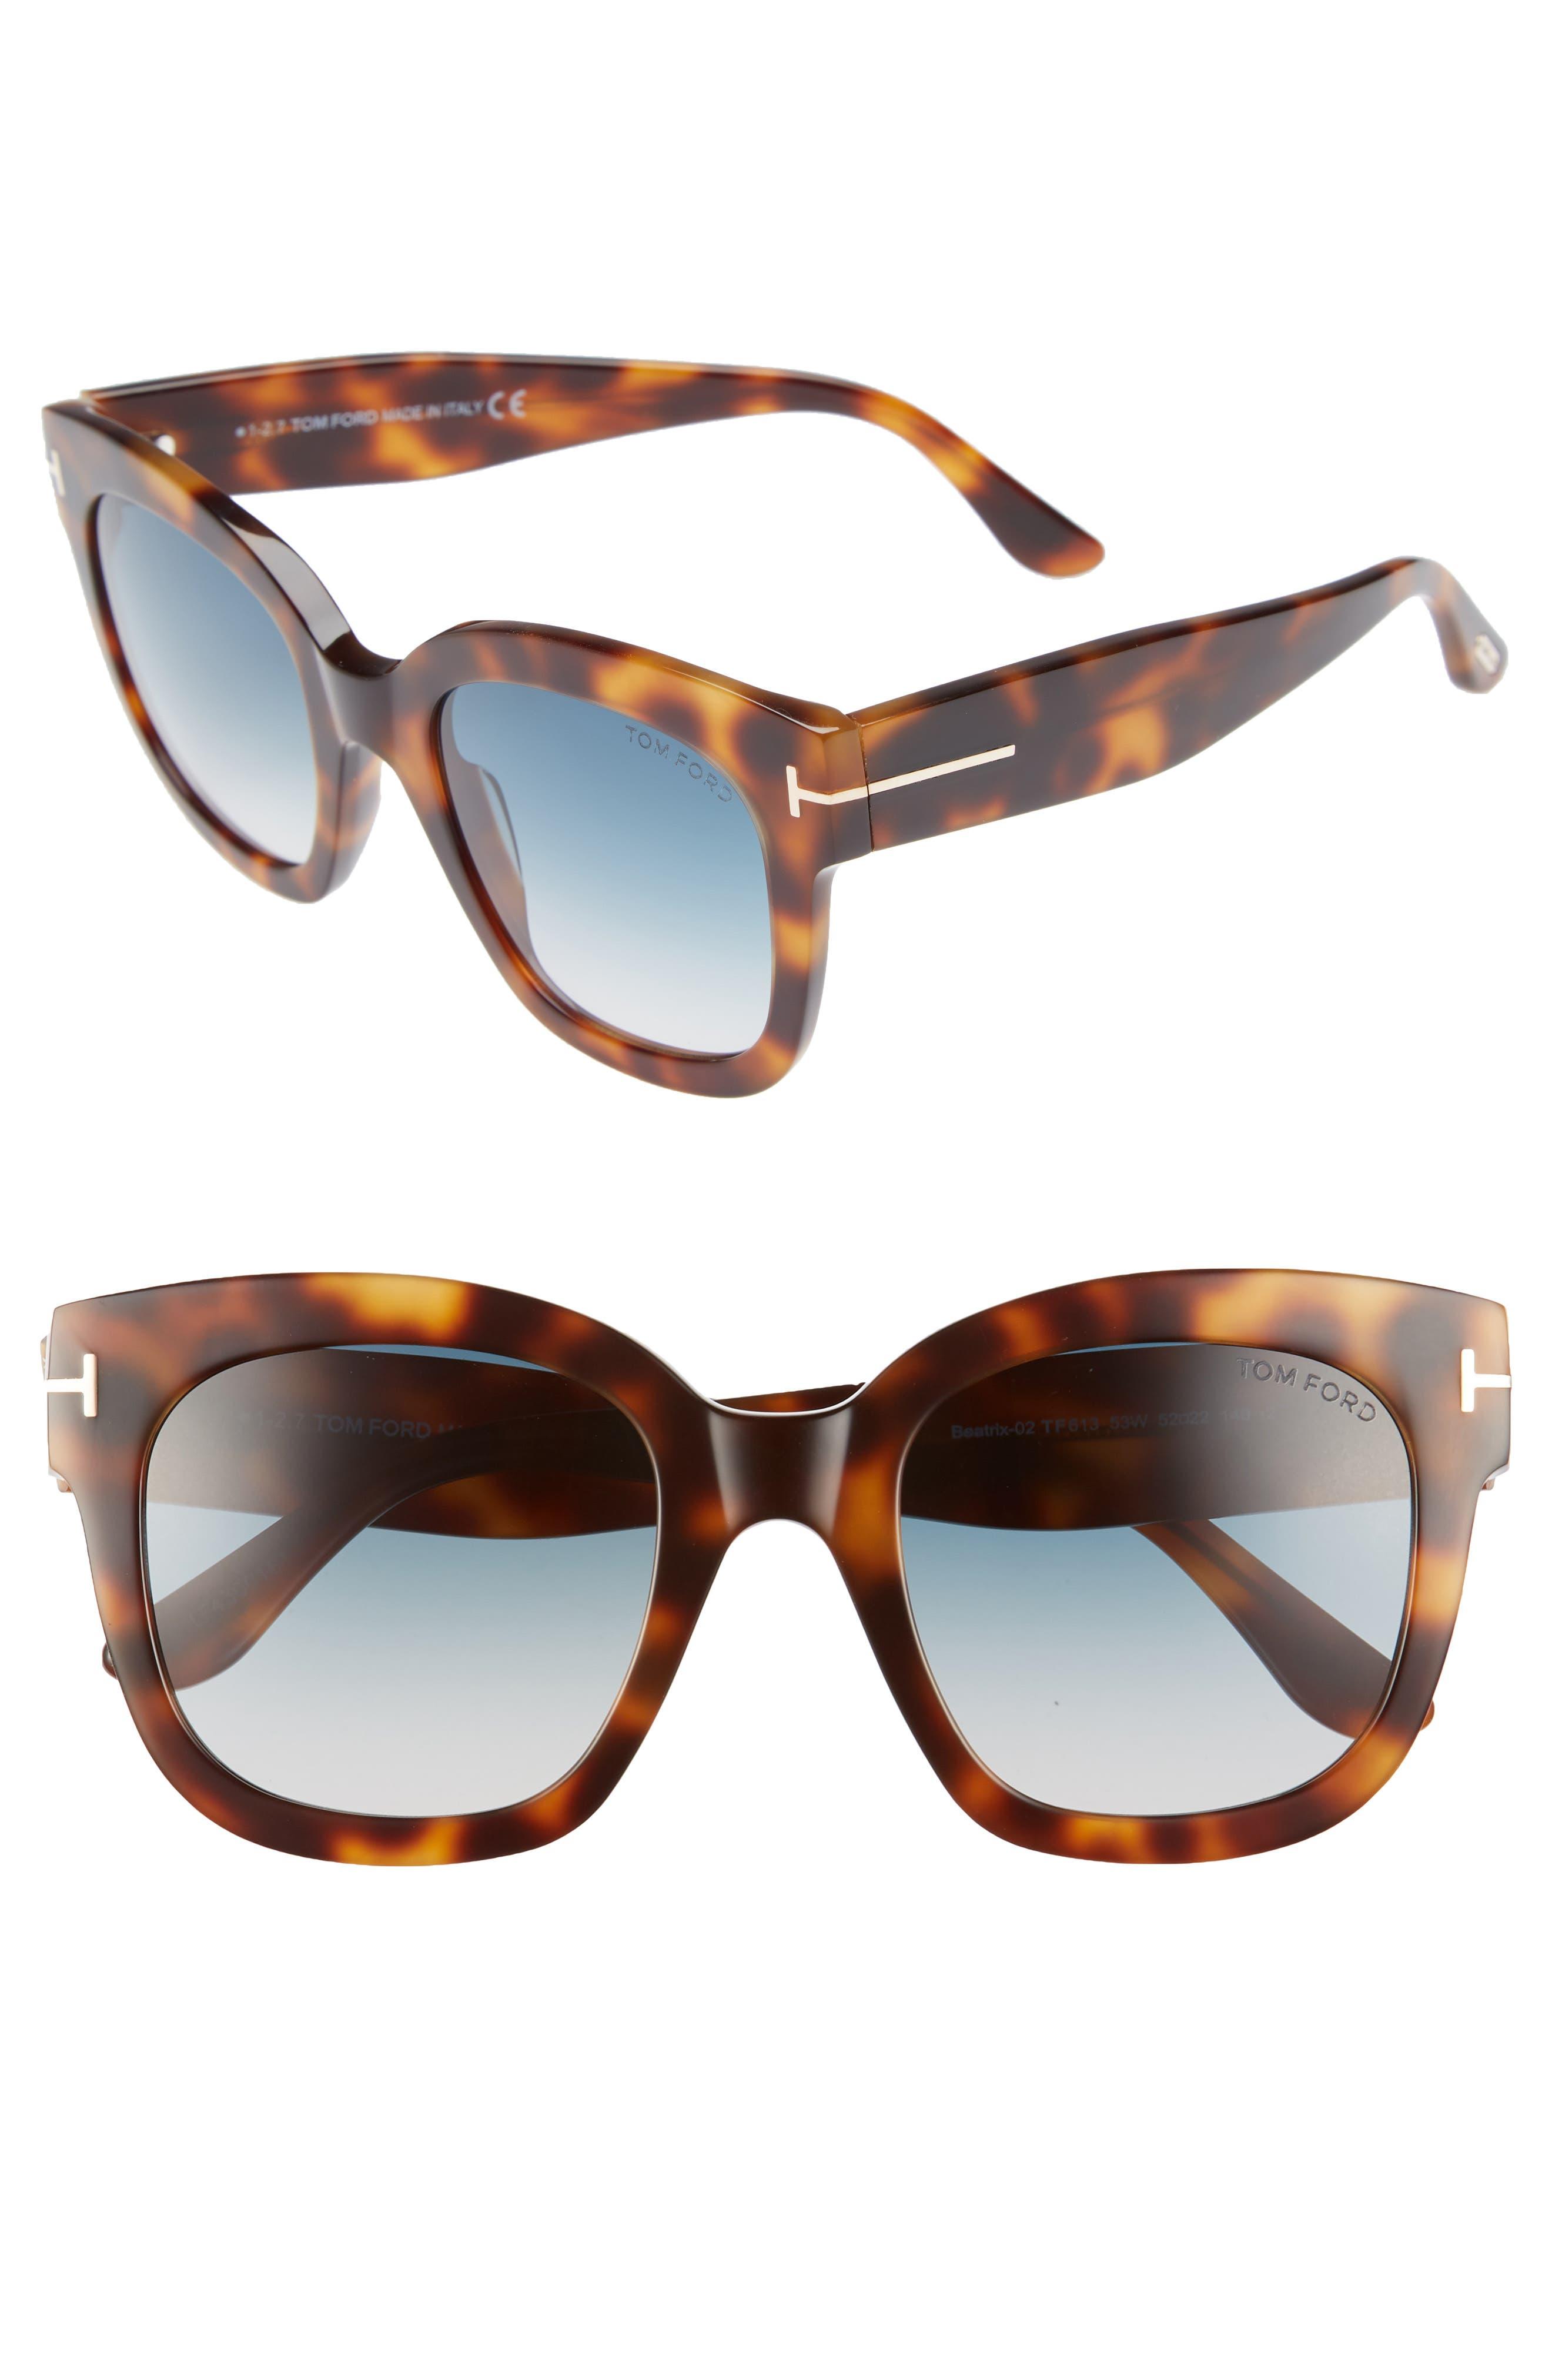 Main Image - Tom Ford Beatrix 52mm Sunglasses